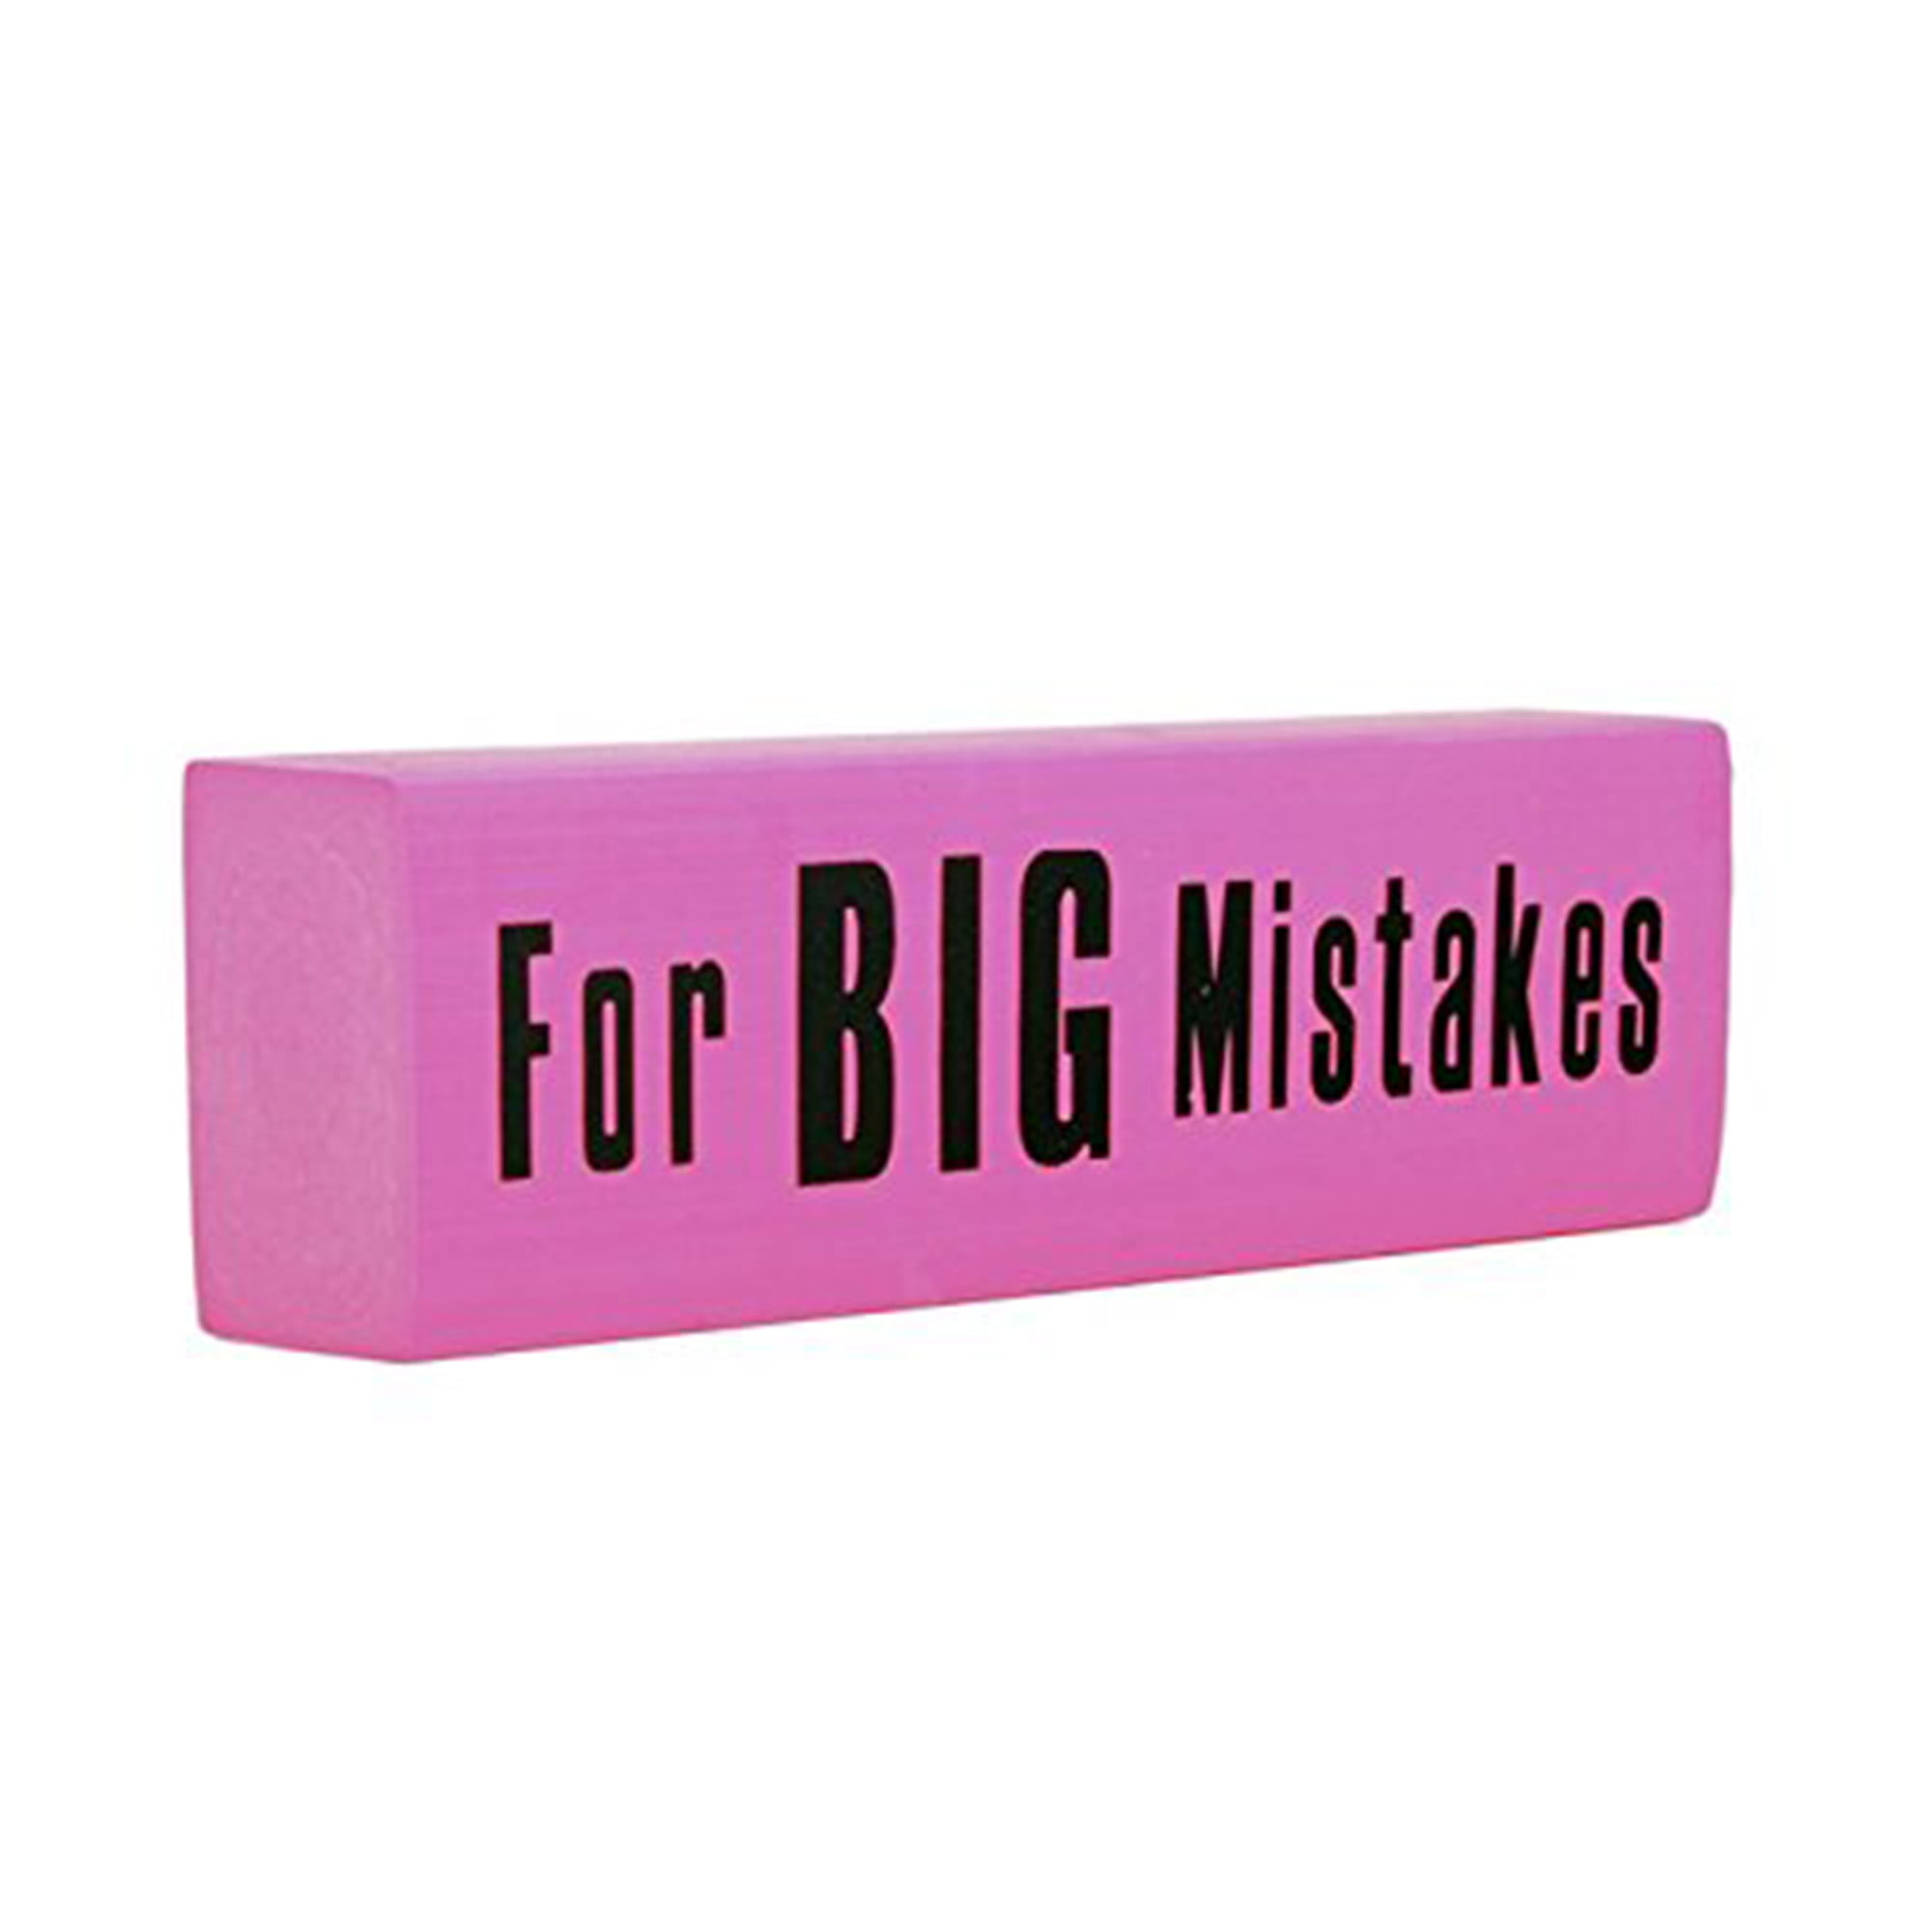 12 NEW BIG MISTAKE ERASER LARGE JUMBO REALLY BIG MISTAKES ERASERS SCHOOL OFFICE